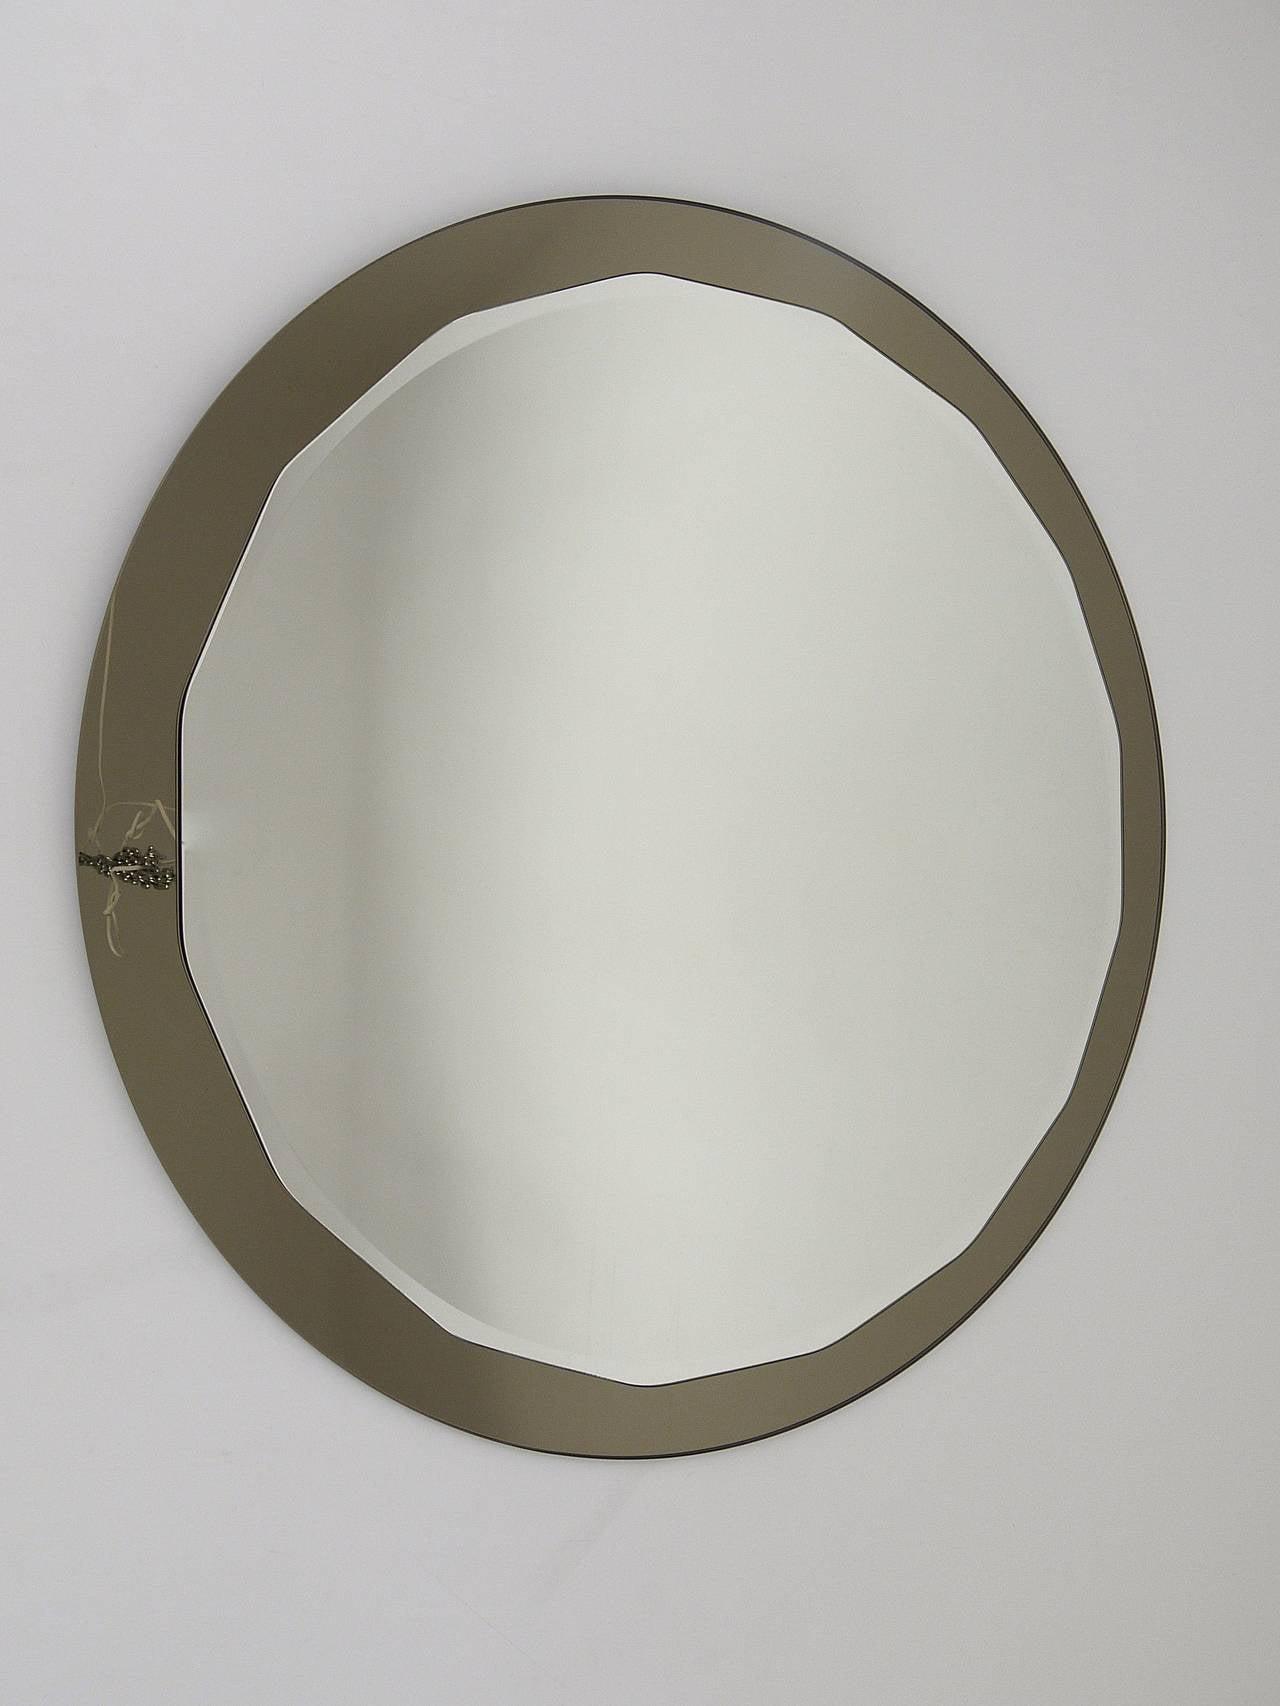 Italian Round Scalloped Crystal Arte Mid-Century Wall Mirror, Italy, 1960s For Sale